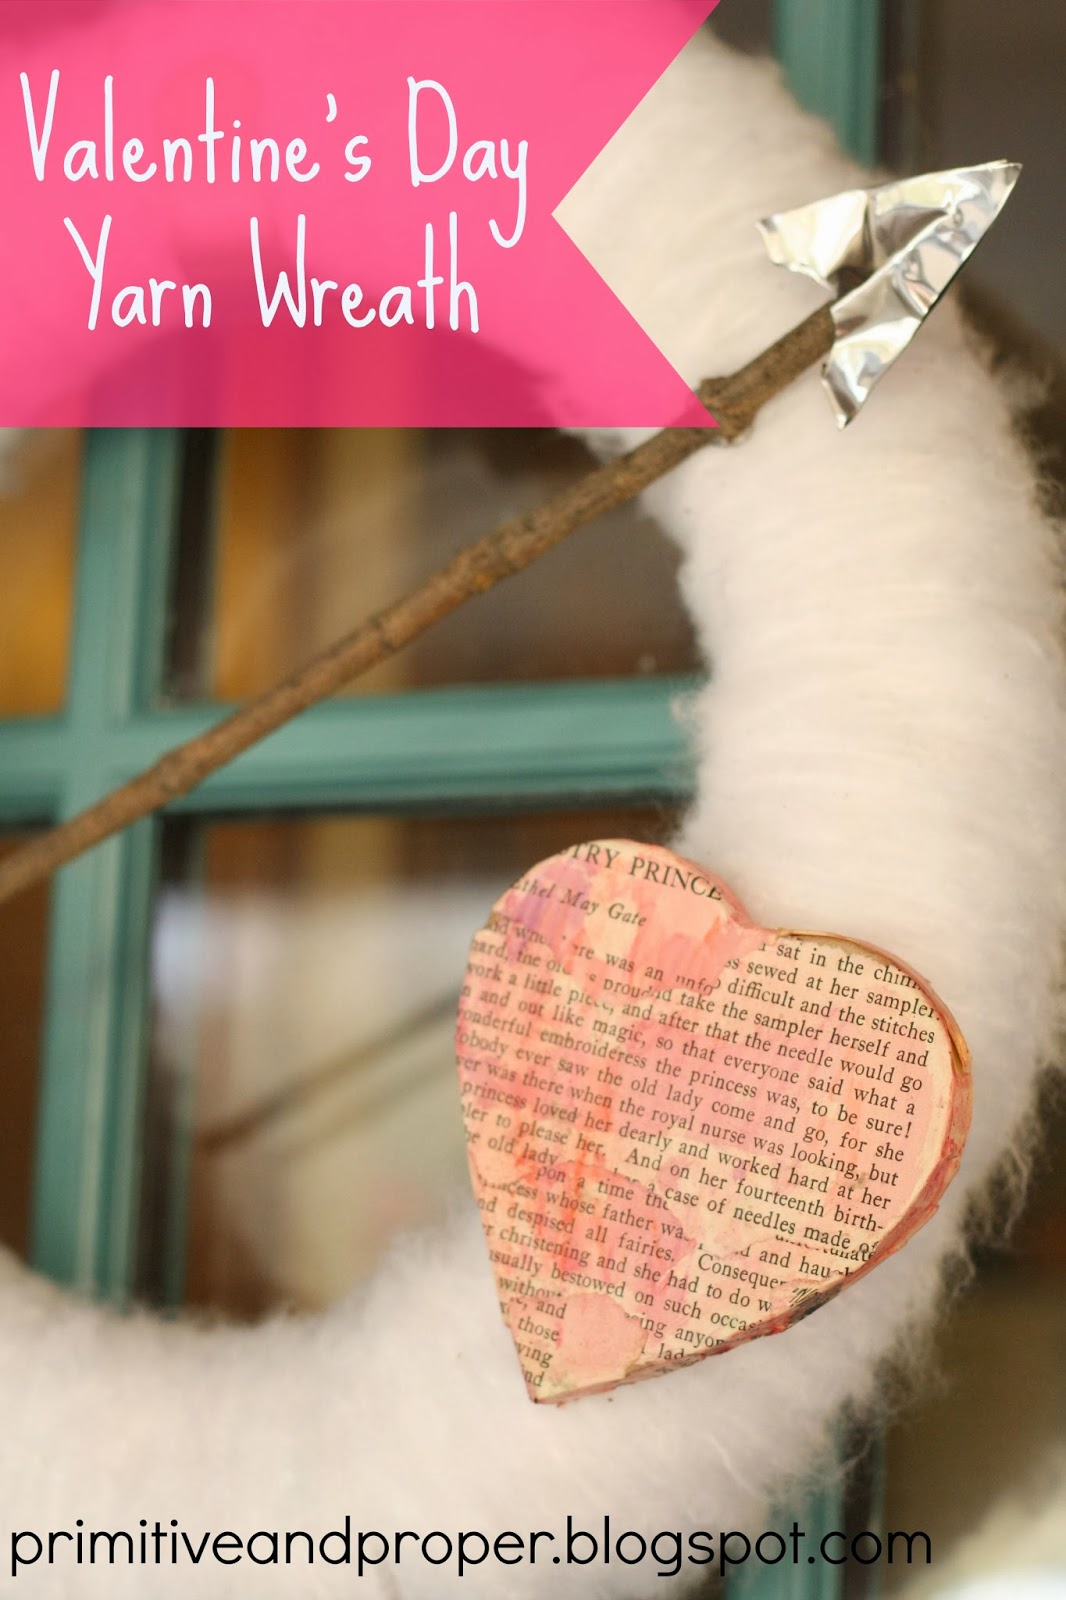 Prayers needed!!! Valentine's Heart & Arrow Wreath, Mantle, And